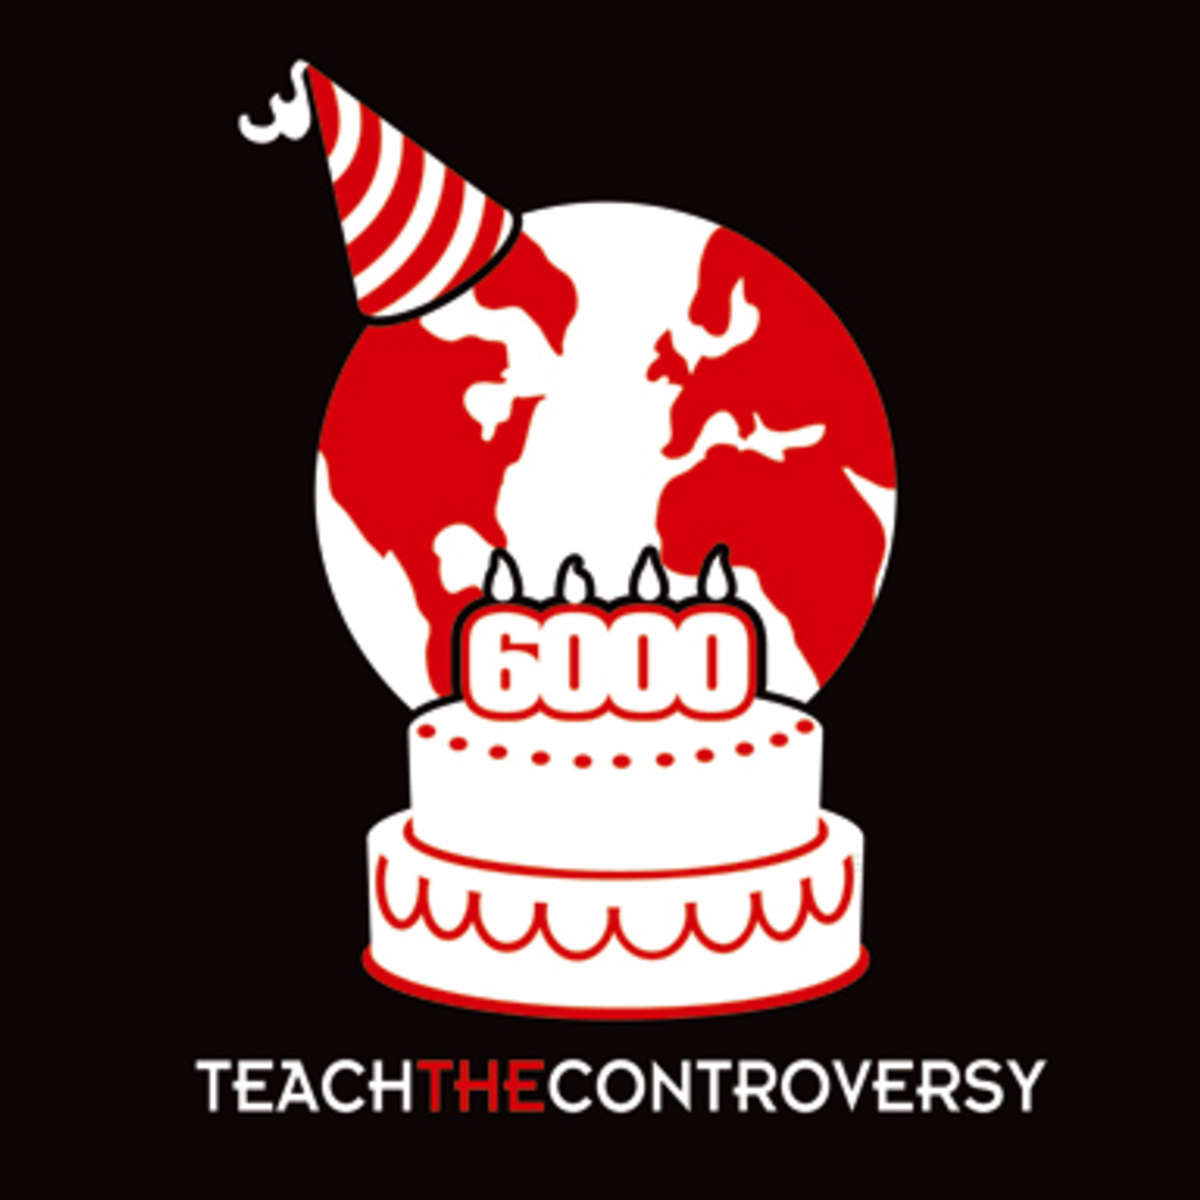 teachcontroversy_creationism_1.jpg